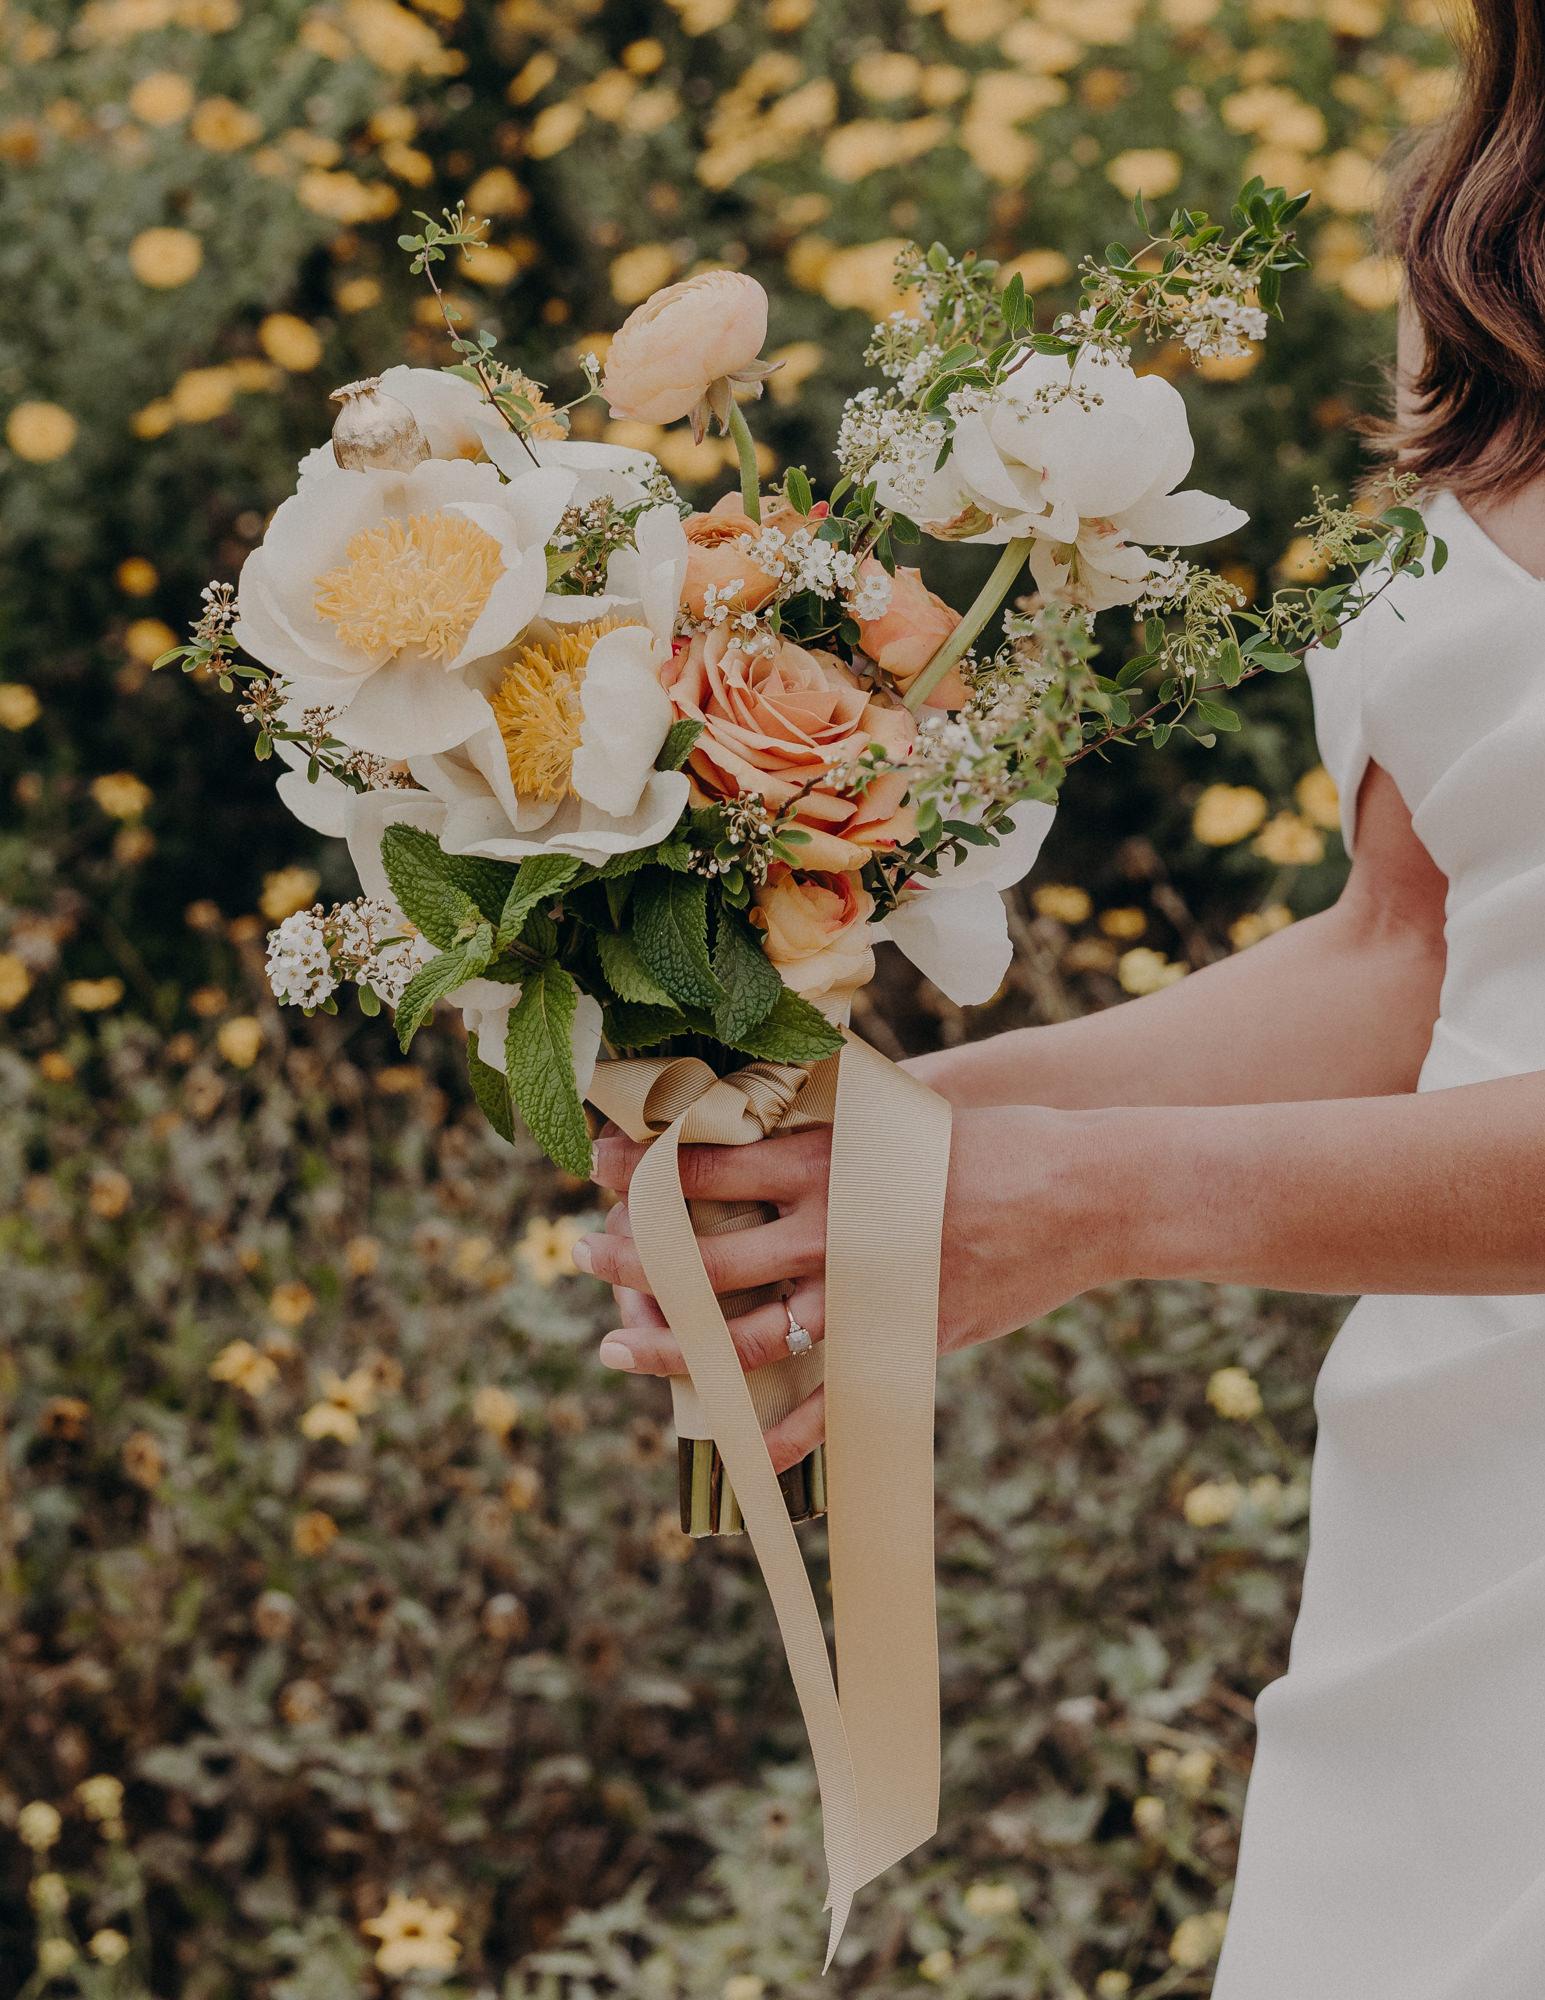 elopement photographer in los angeles - la wedding photographer - isaiahandtaylor.com-004.jpg